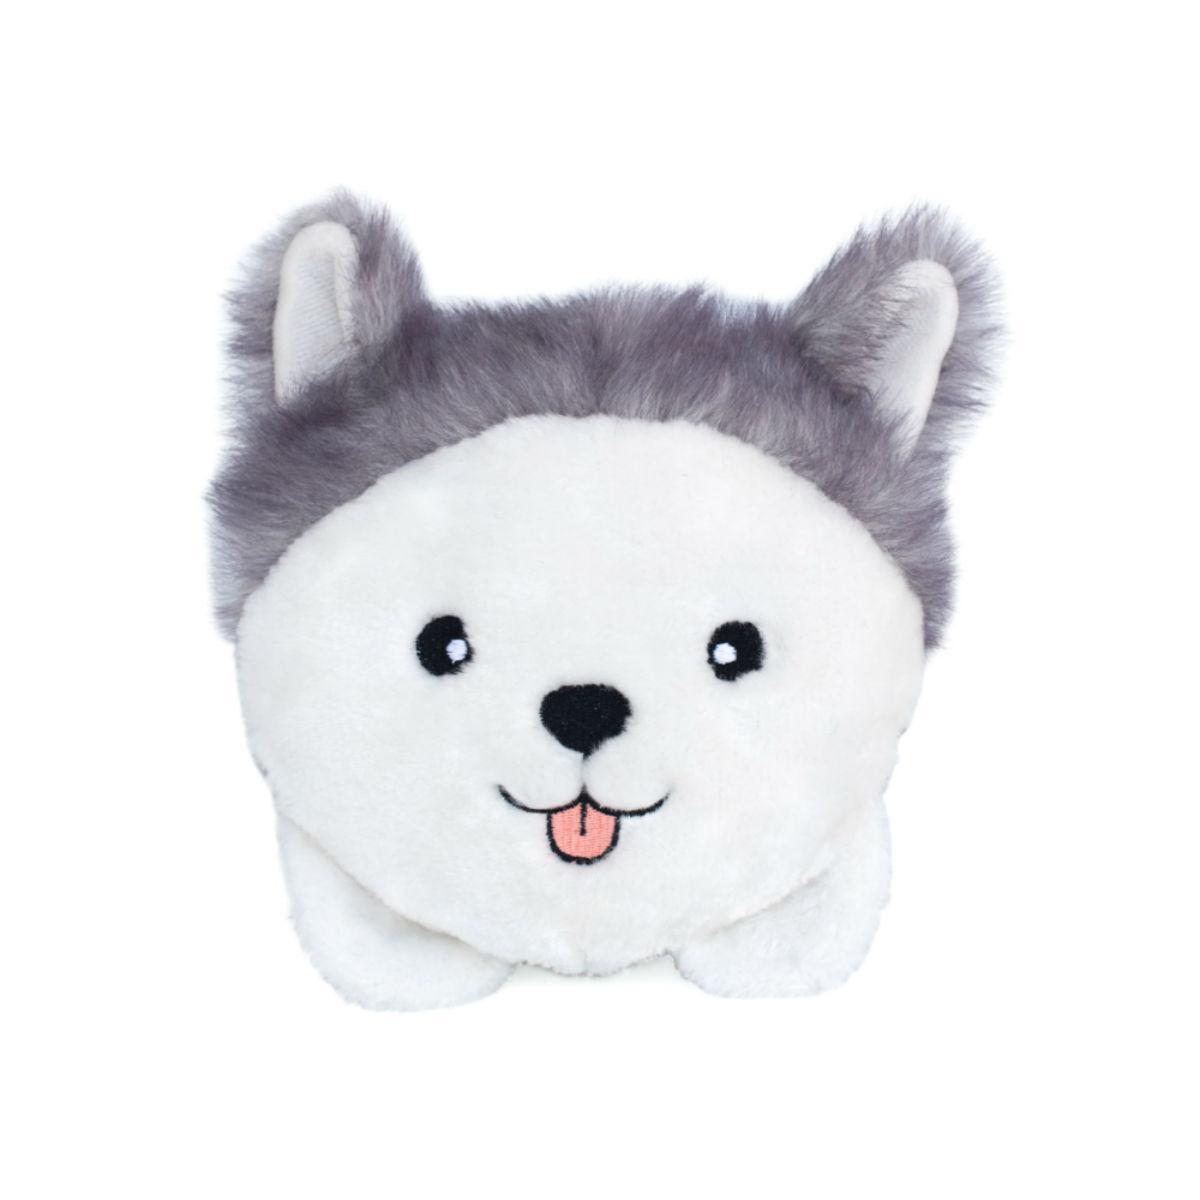 ZippyPaws Squeaky Buns Dog Toy - Husky